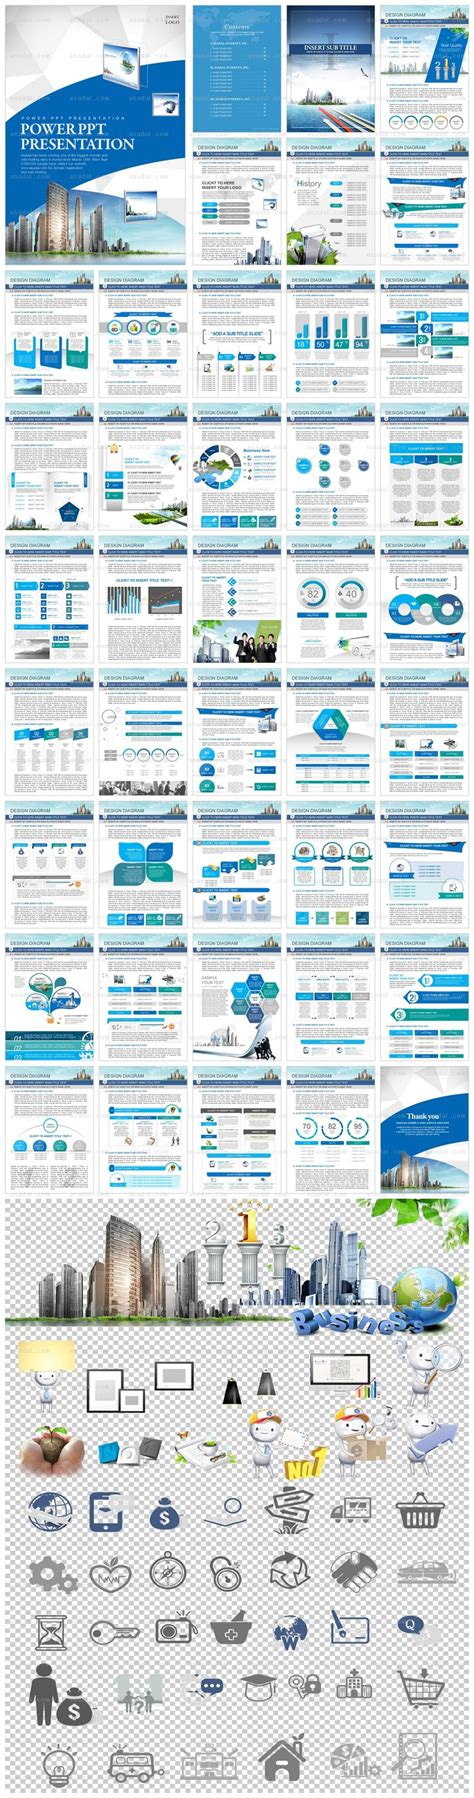 lyx templates for presentation 세로 비즈니스 회사소개서 0124 바니피티 파워포인트 ppt 템플릿 디자인 ppt